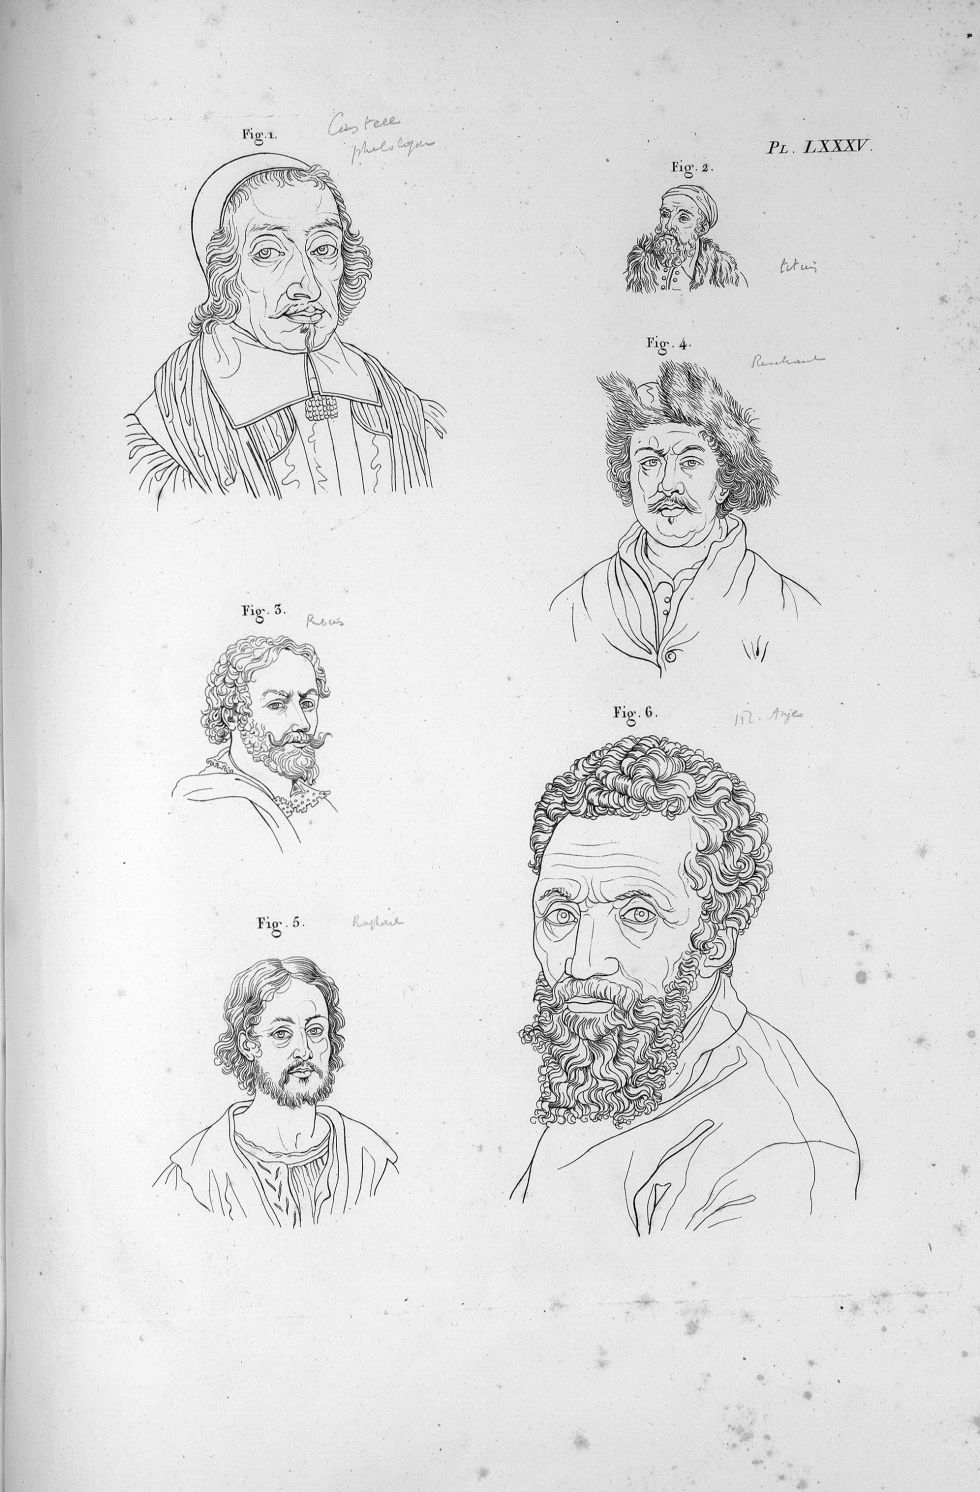 Pl. LXXXV. Fig. 1. Edmond Castellus / Fig. 2. Titien / Fig. 3. Rubens / Fig. 4. Rembrandt / Fig. 5.  [...] - Anatomie. Neurologie. Têtes. Phrénologie. 19e siècle (France) - med00575x04x0303